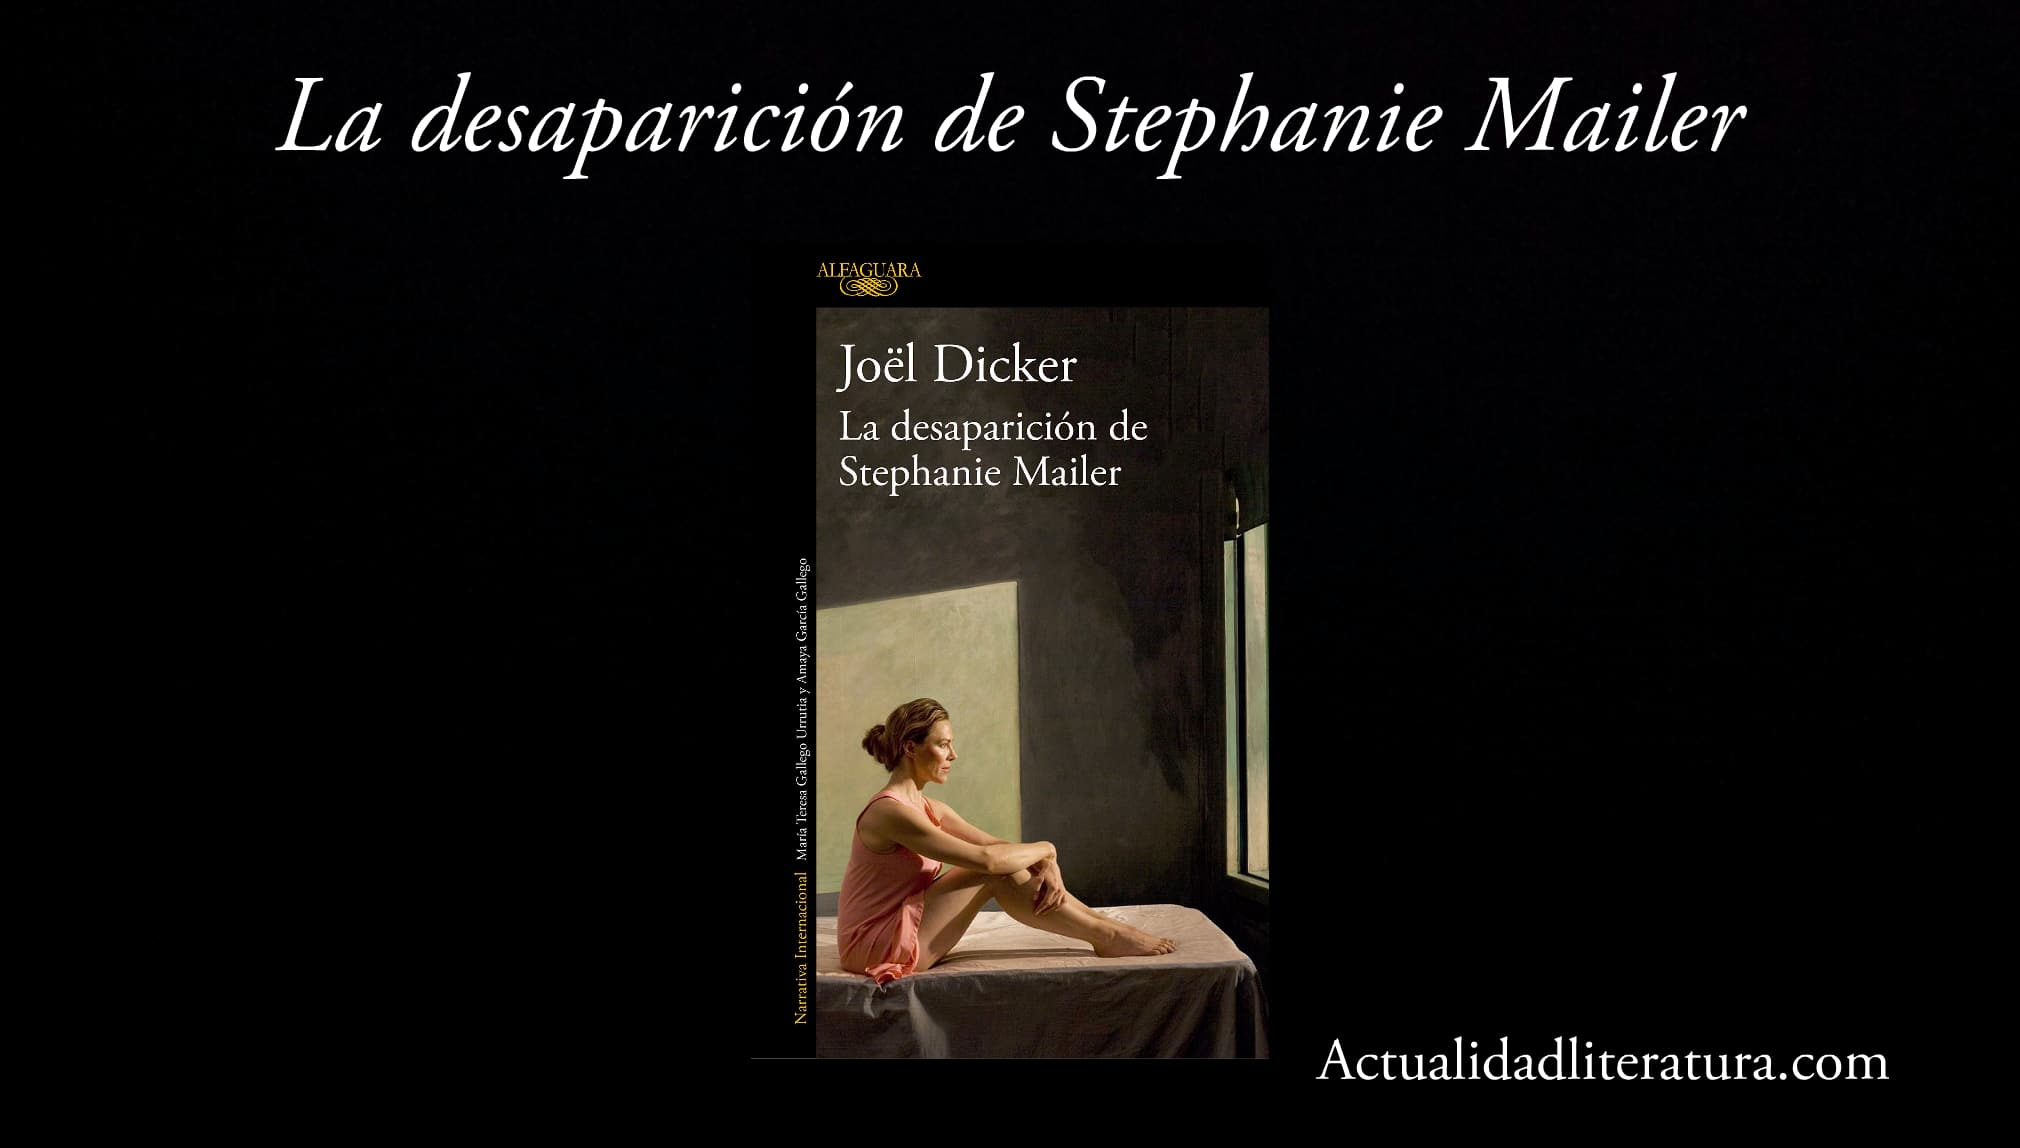 La desaparicion de Stephanie Mailer.